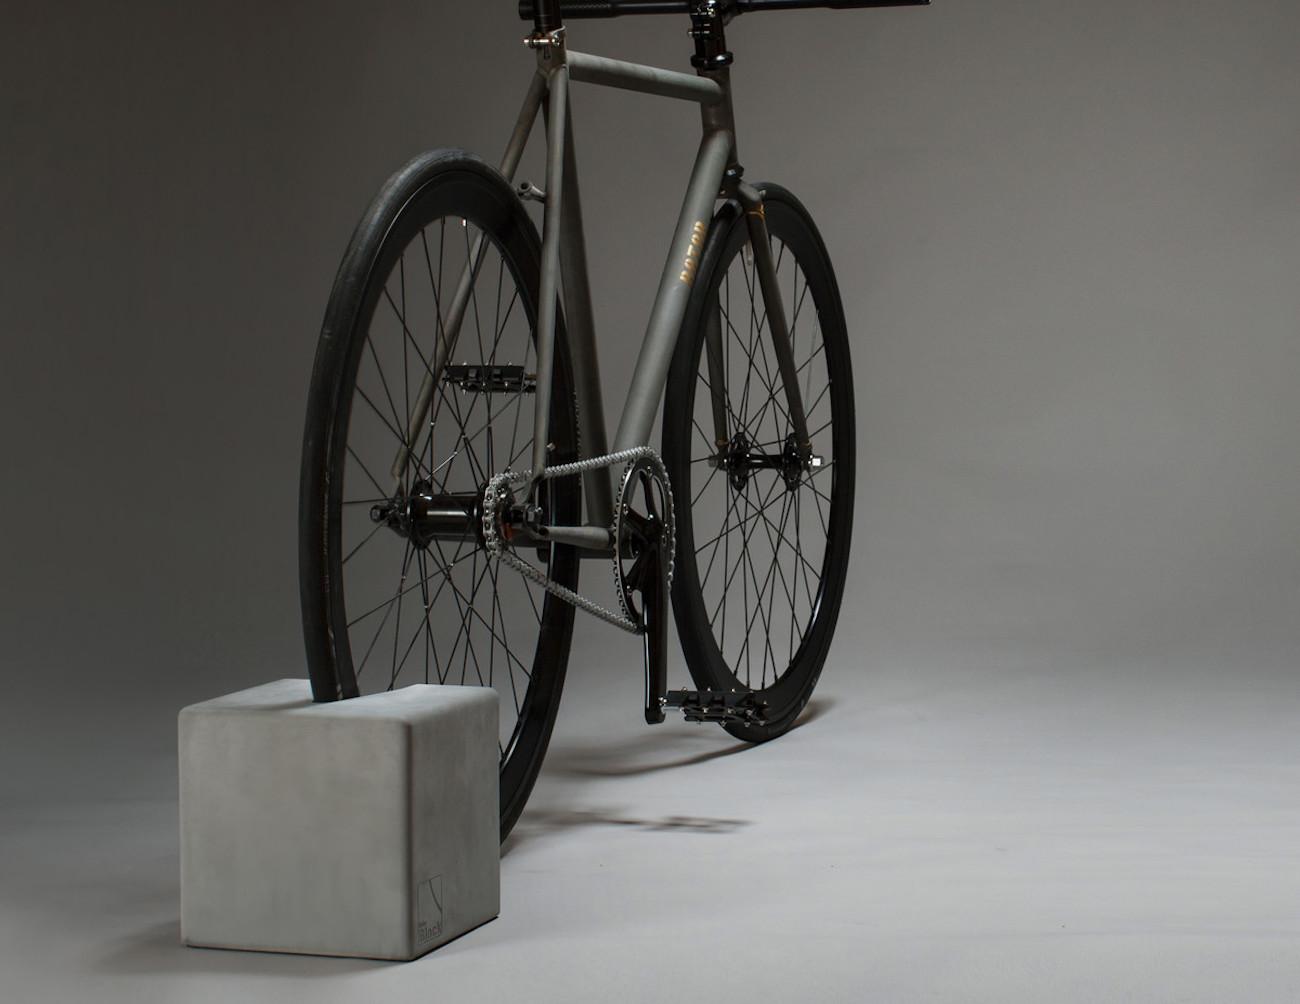 BikeBlock Concrete Bike Stand by urbanature